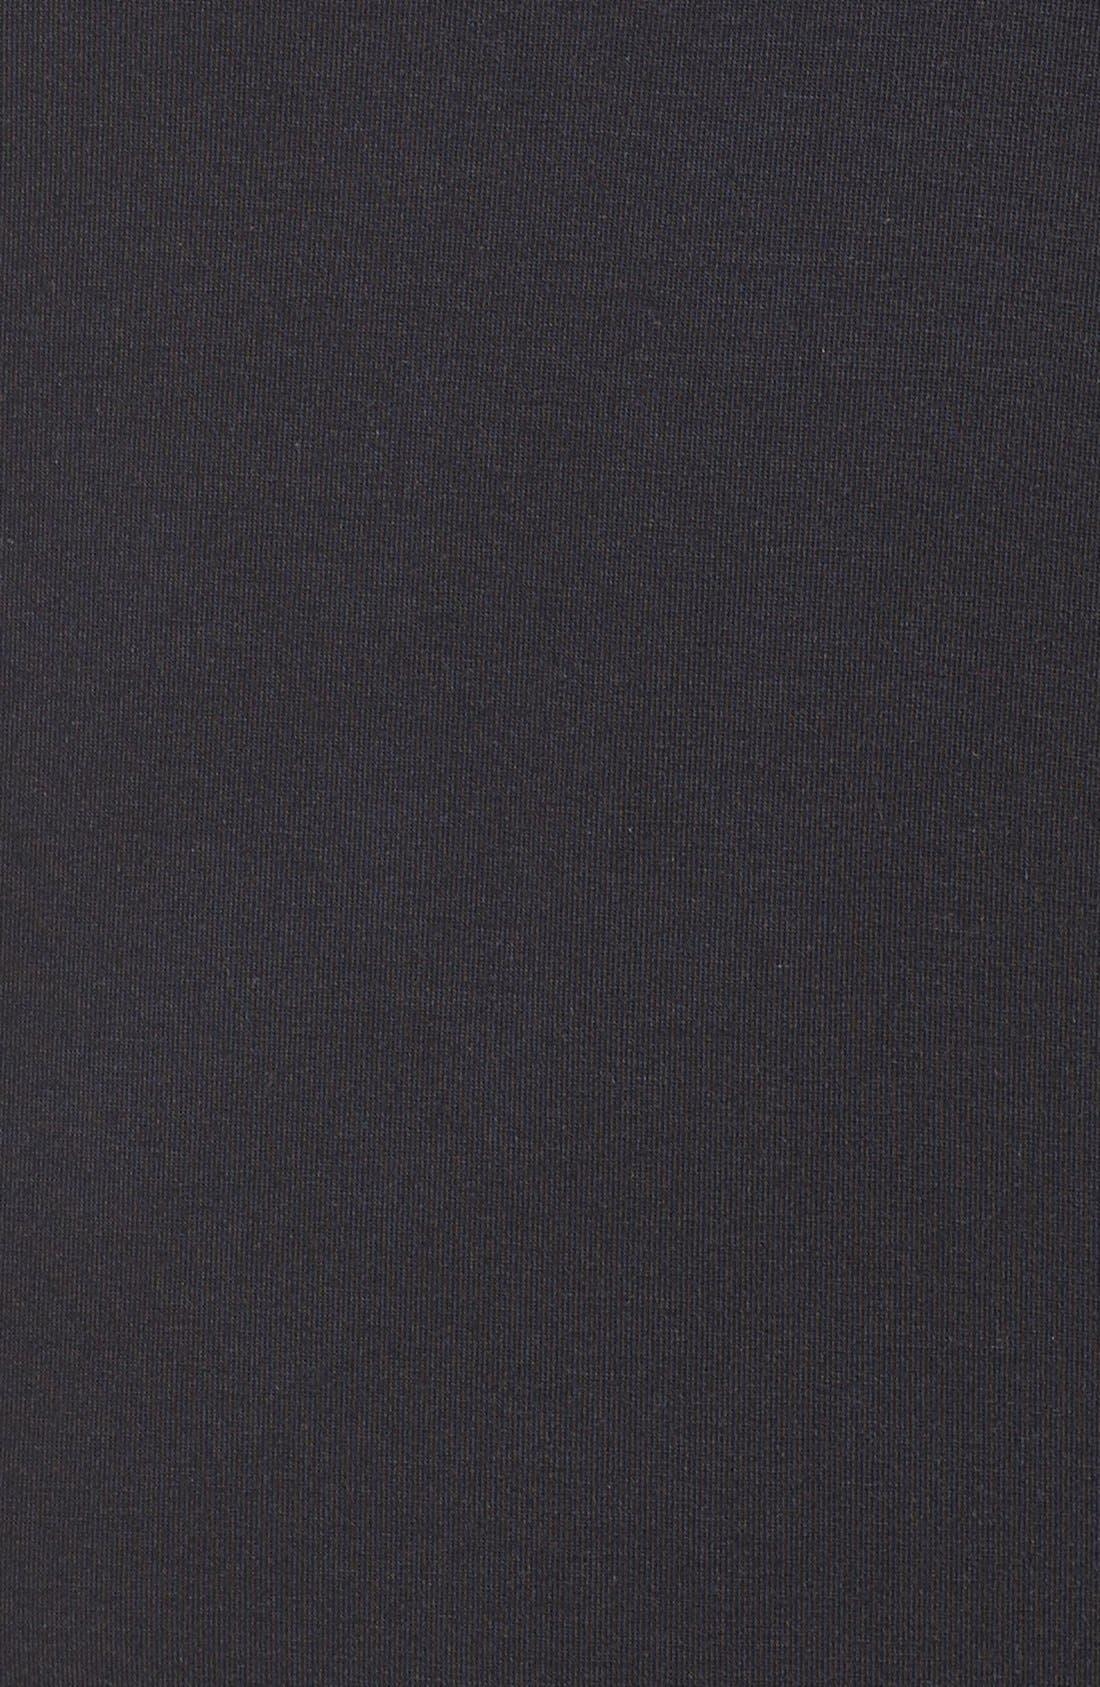 Short Sleeve Tee,                             Alternate thumbnail 7, color,                             BLACK